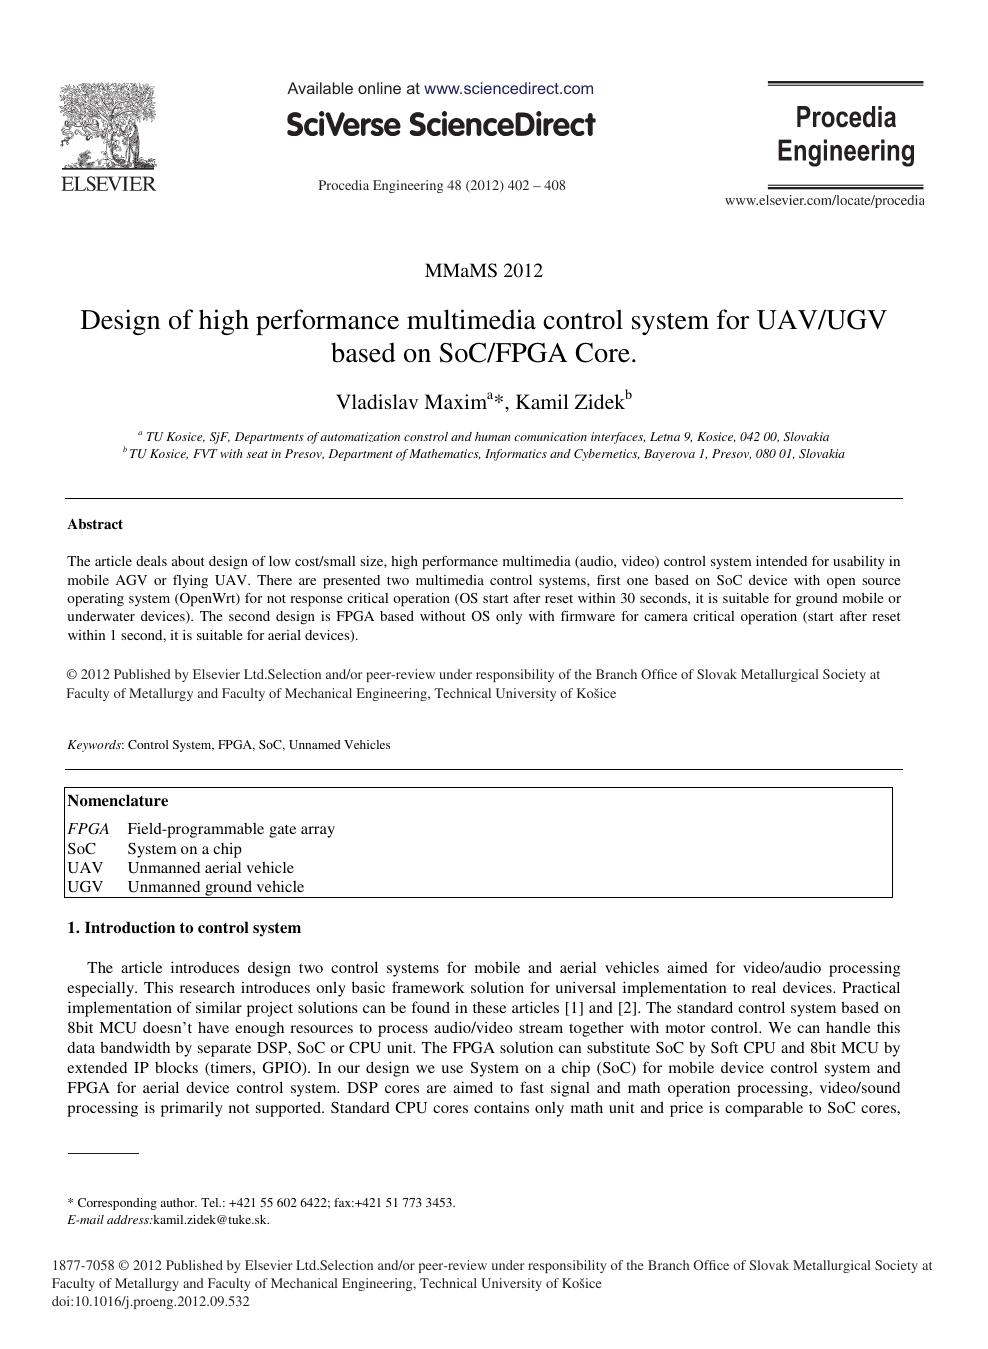 Design of High Performance Multimedia Control System for UAV